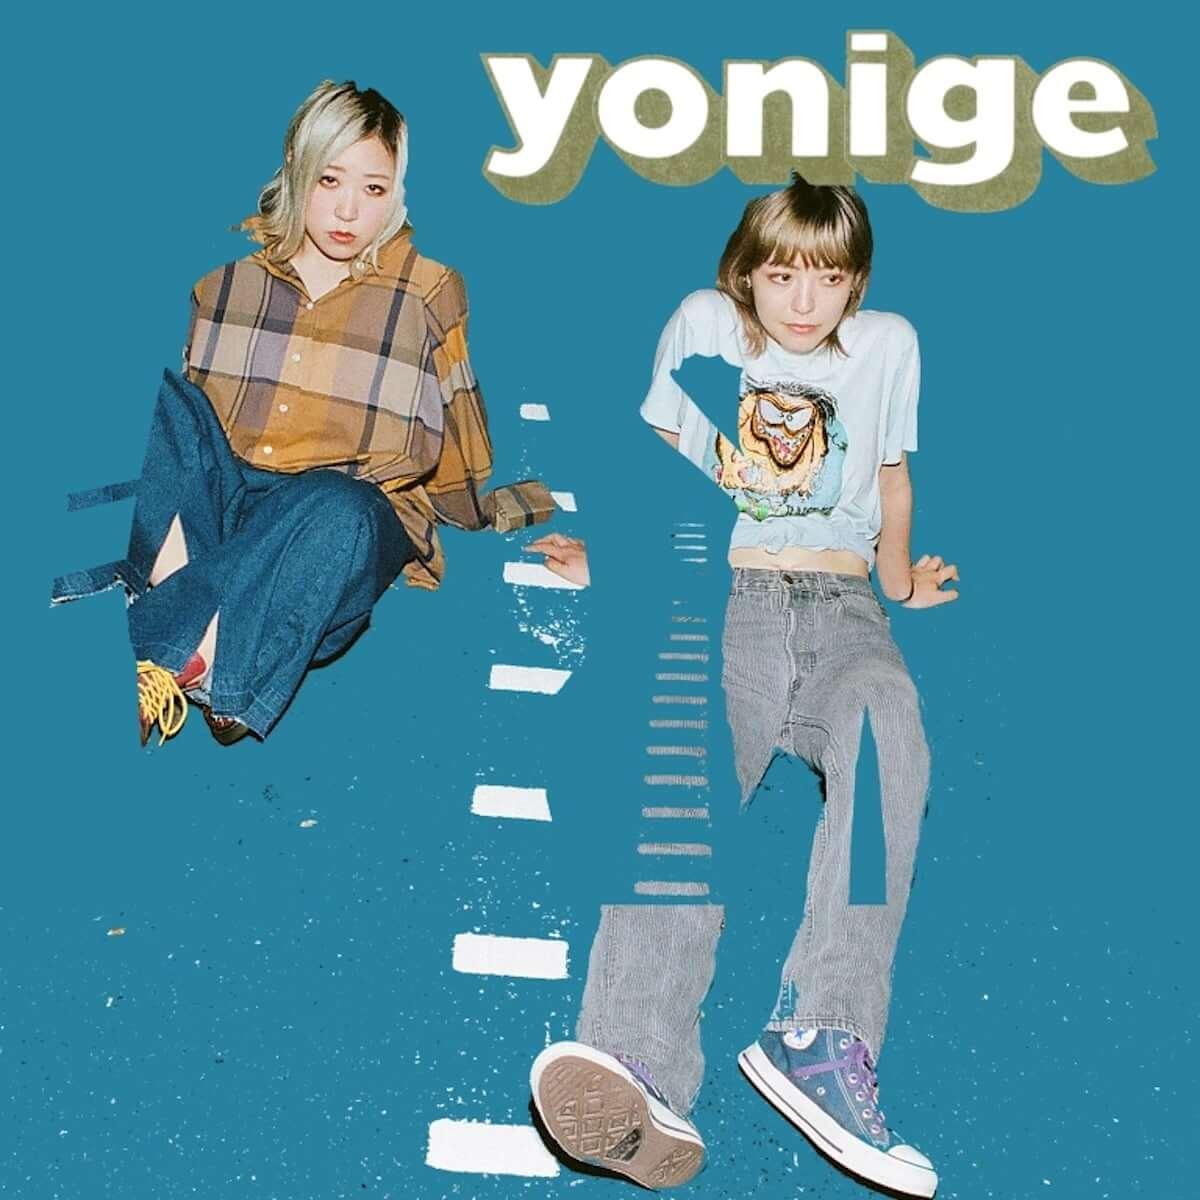 yonige「アボカド」「さよならアイデンティティー」他インディーズ時代の一部楽曲がサブスク解禁! interview181009_yonige_hoouse_02-1200x1200